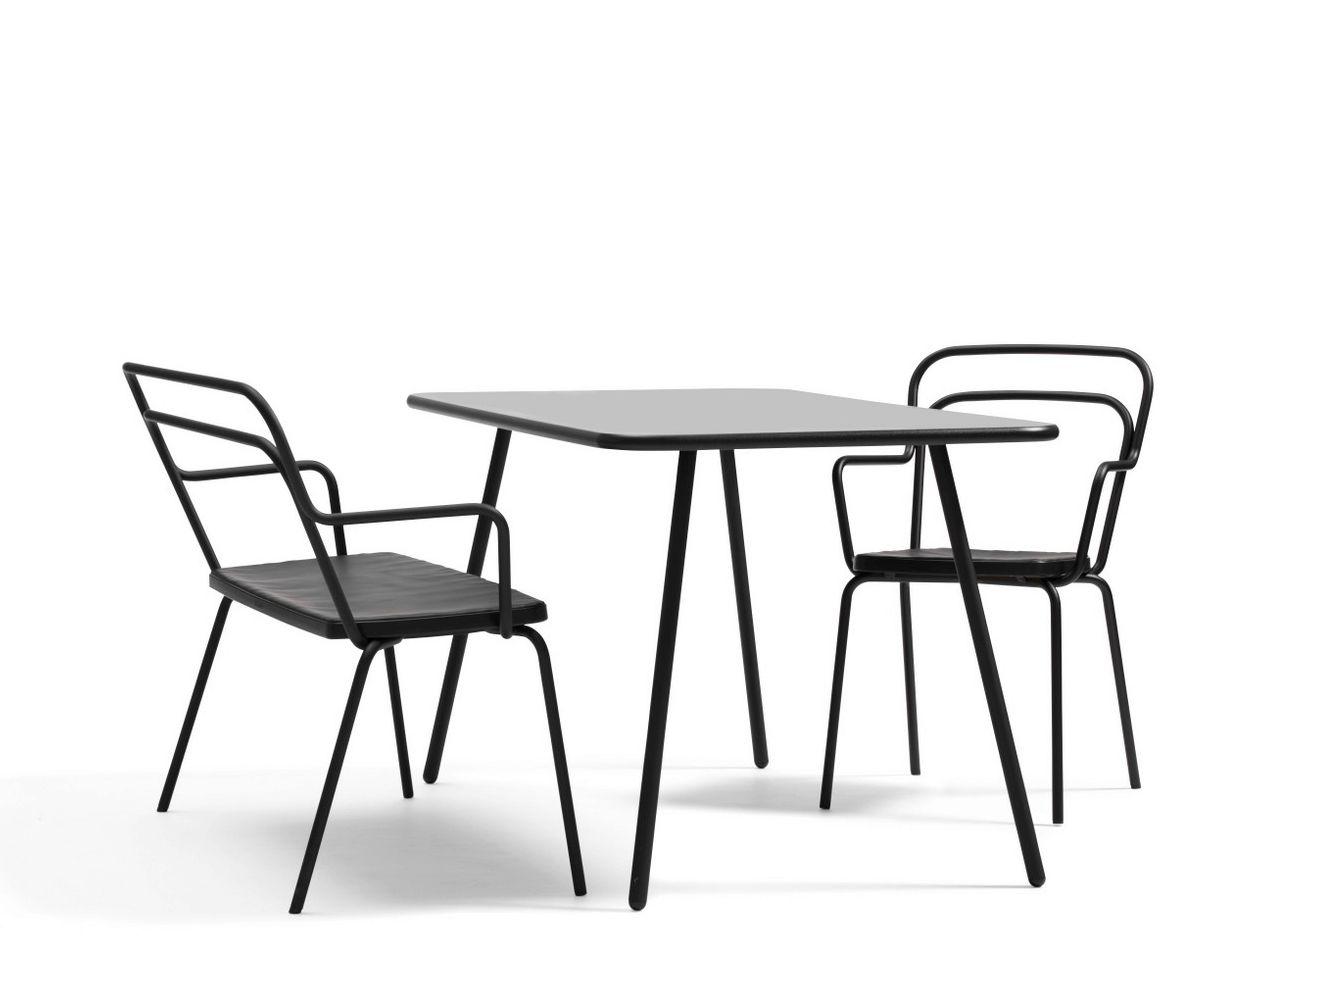 Kaffe high garden side table by bl station design for Outdoor furniture revit